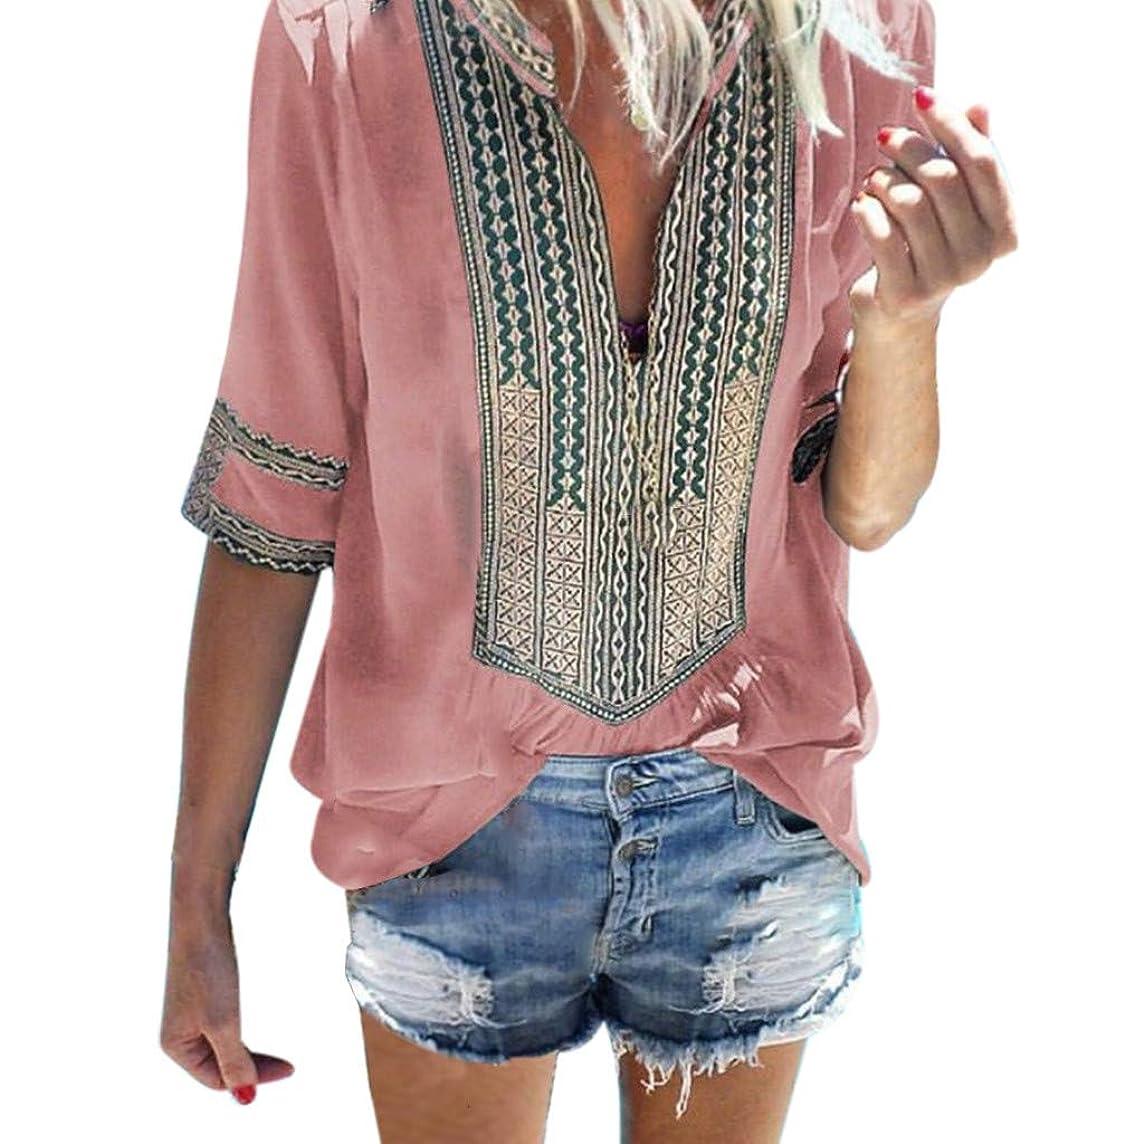 Sunhusing Women's Deep V-Neck Bohemian Print Half Sleeve Tops Casual Beach Wind T-Shirt